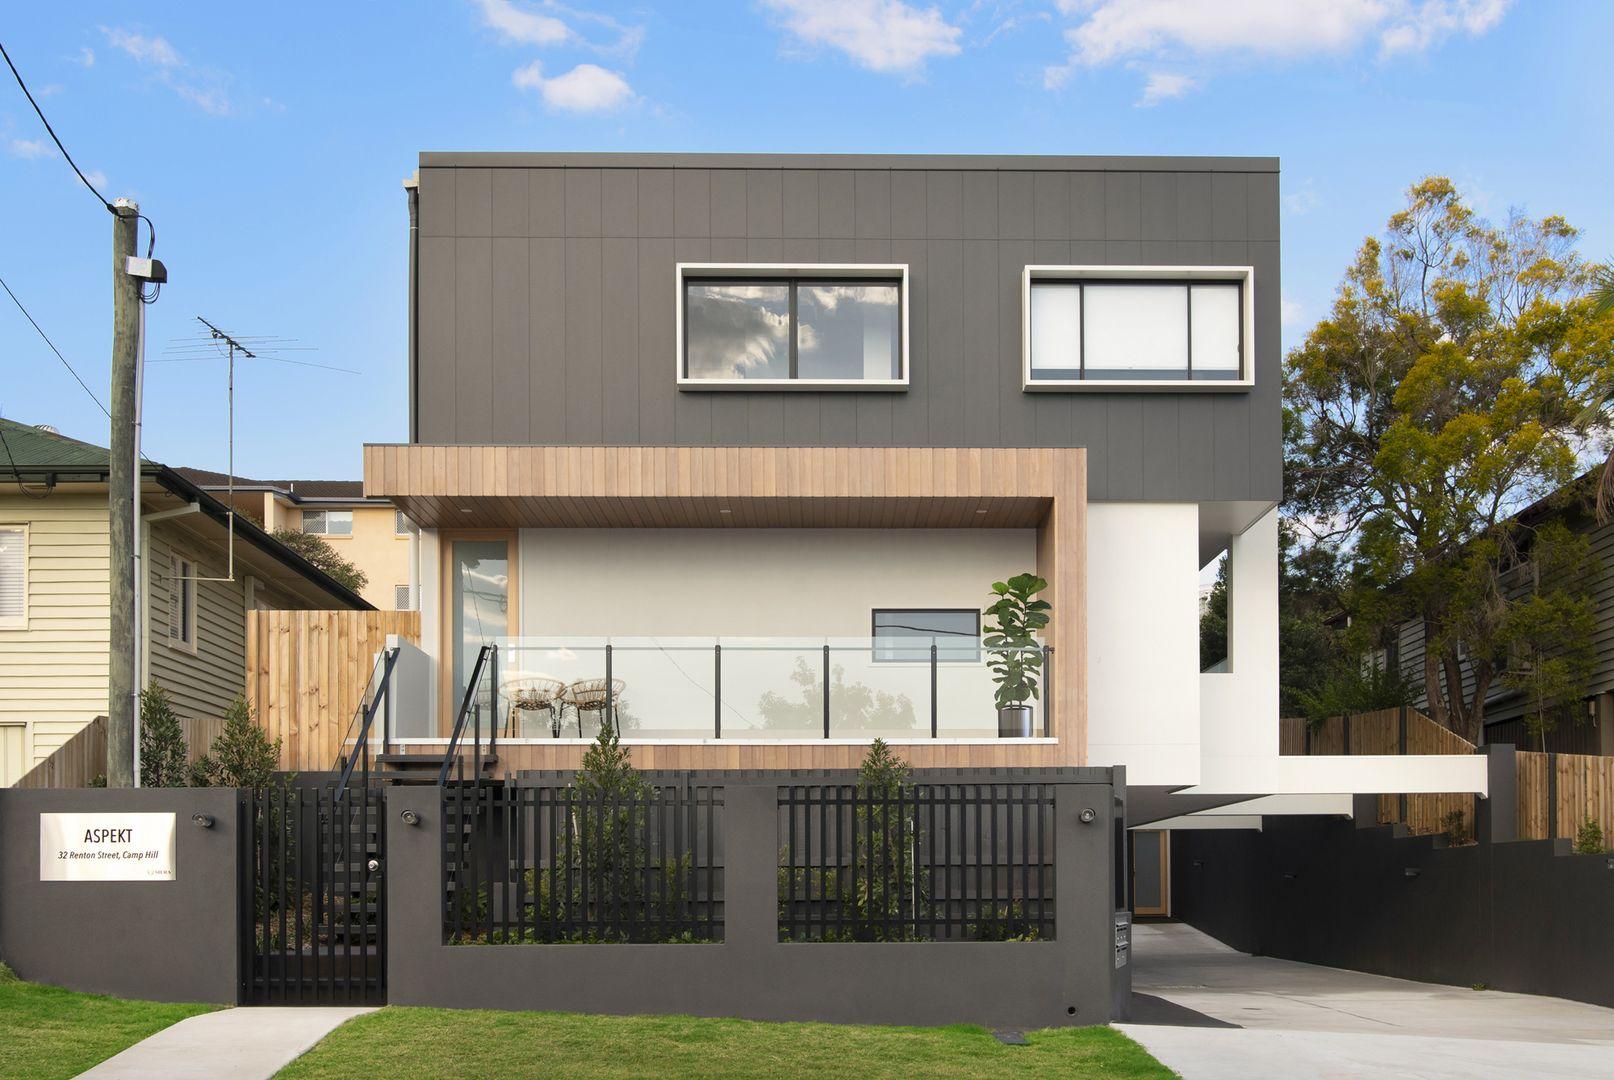 3/32 Renton Street, Camp Hill QLD 4152, Image 0